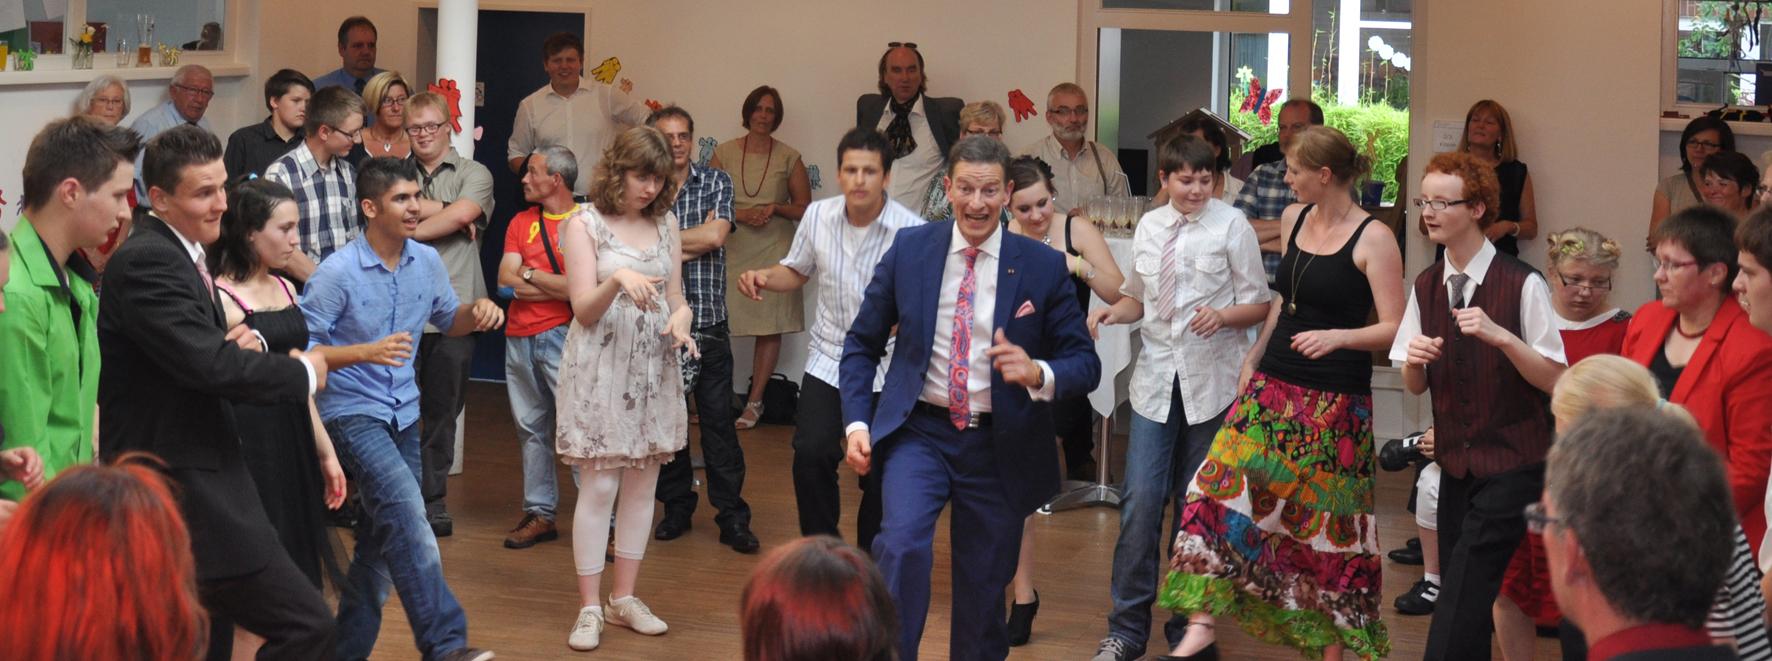 Susanne-Raming-Schule in Bad Laer feiert Abschlussball mit Michael Hull